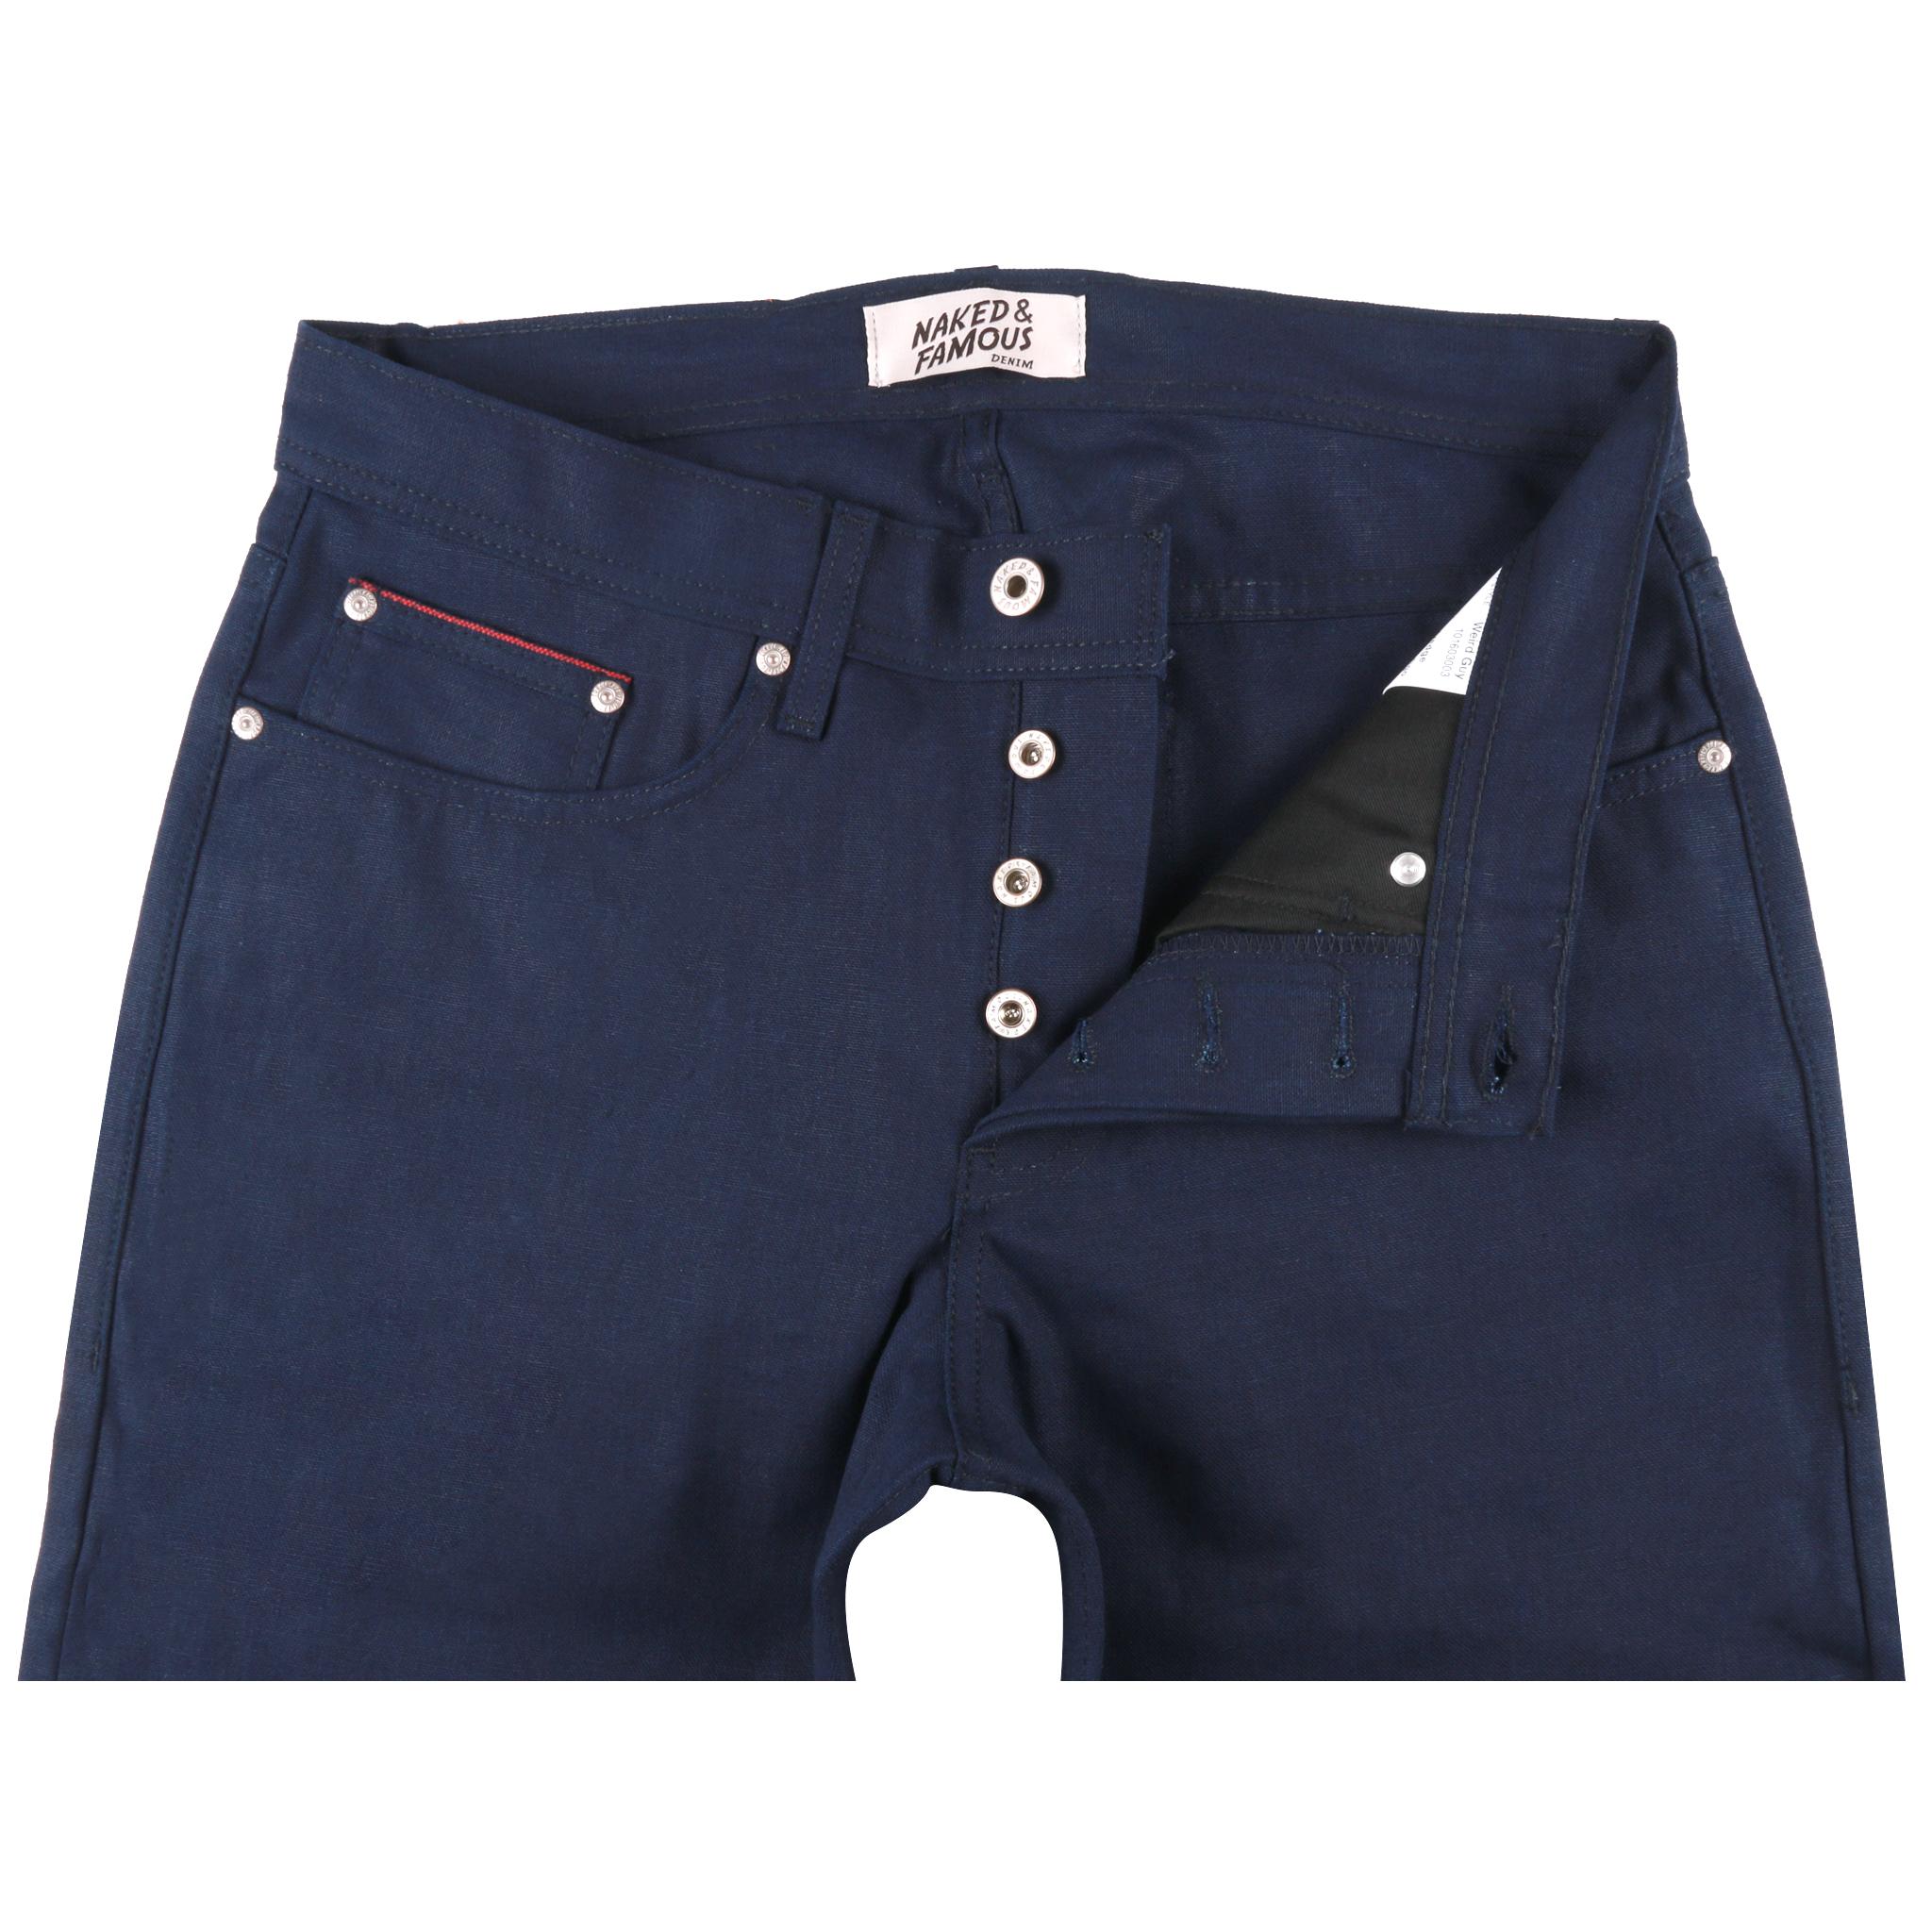 Indigo Duck Canvas Selvedge jeans front